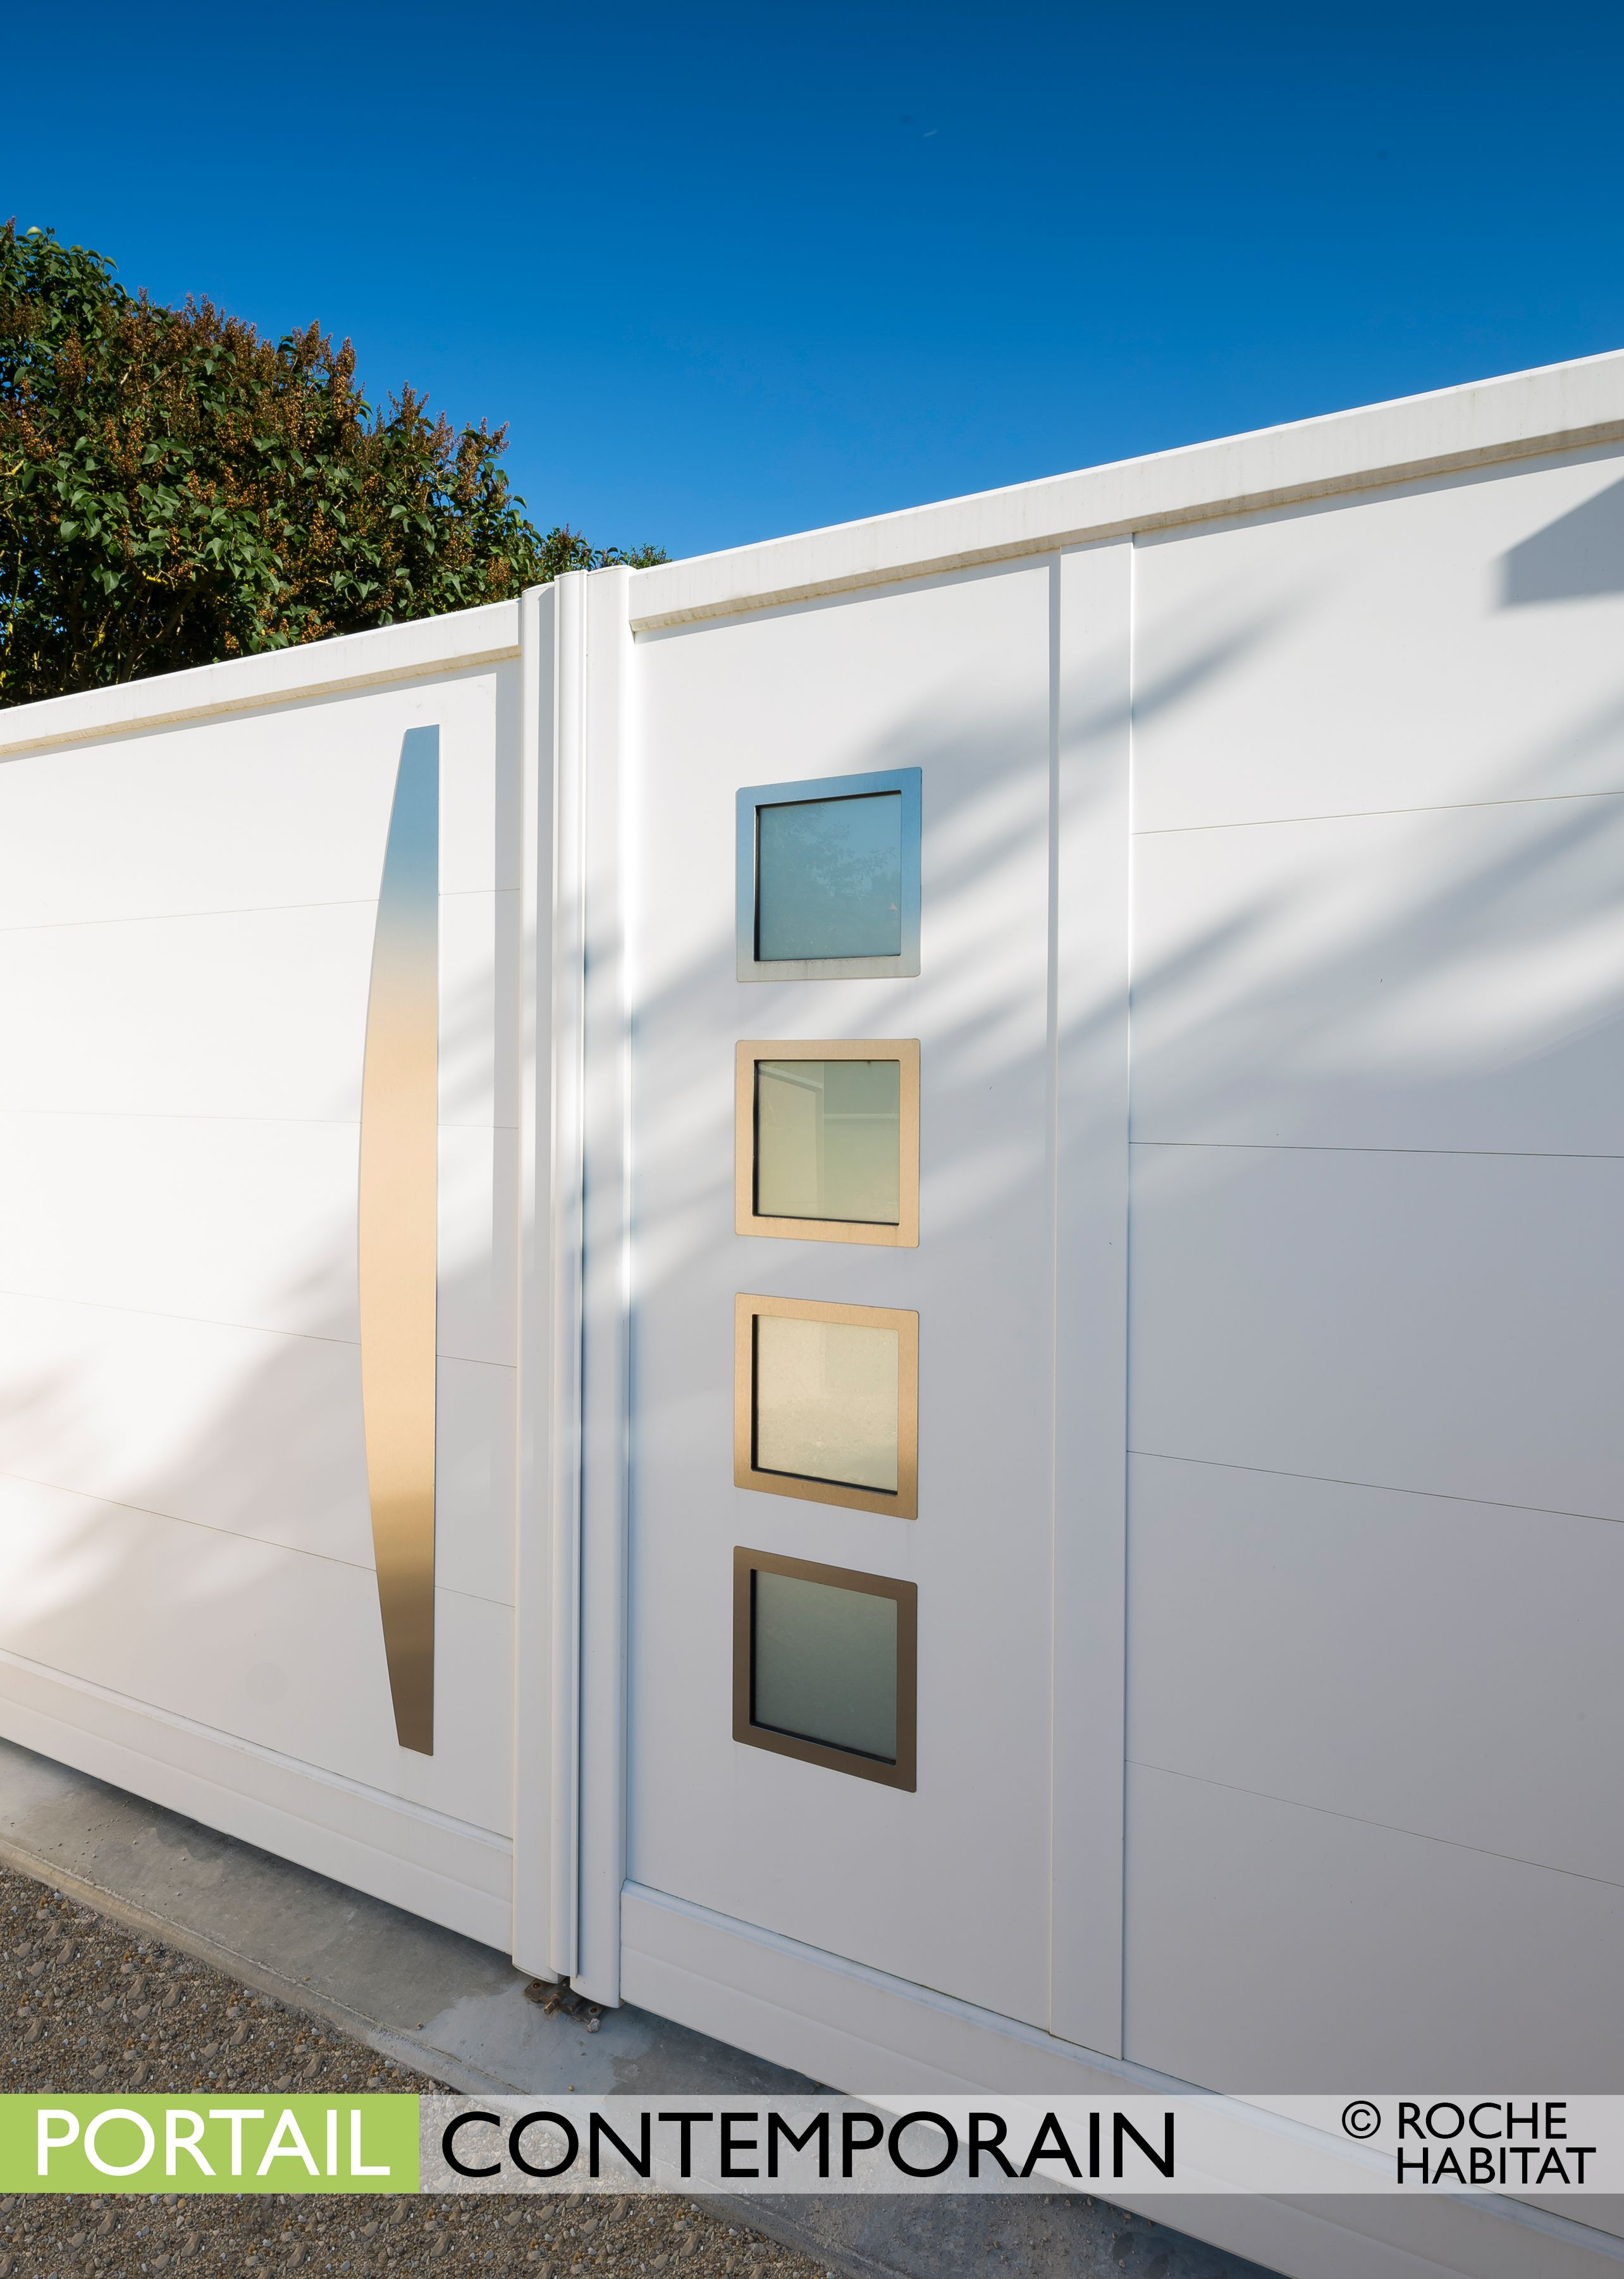 Portail contemporain by roche habitat le portail new york for Habitat contemporain